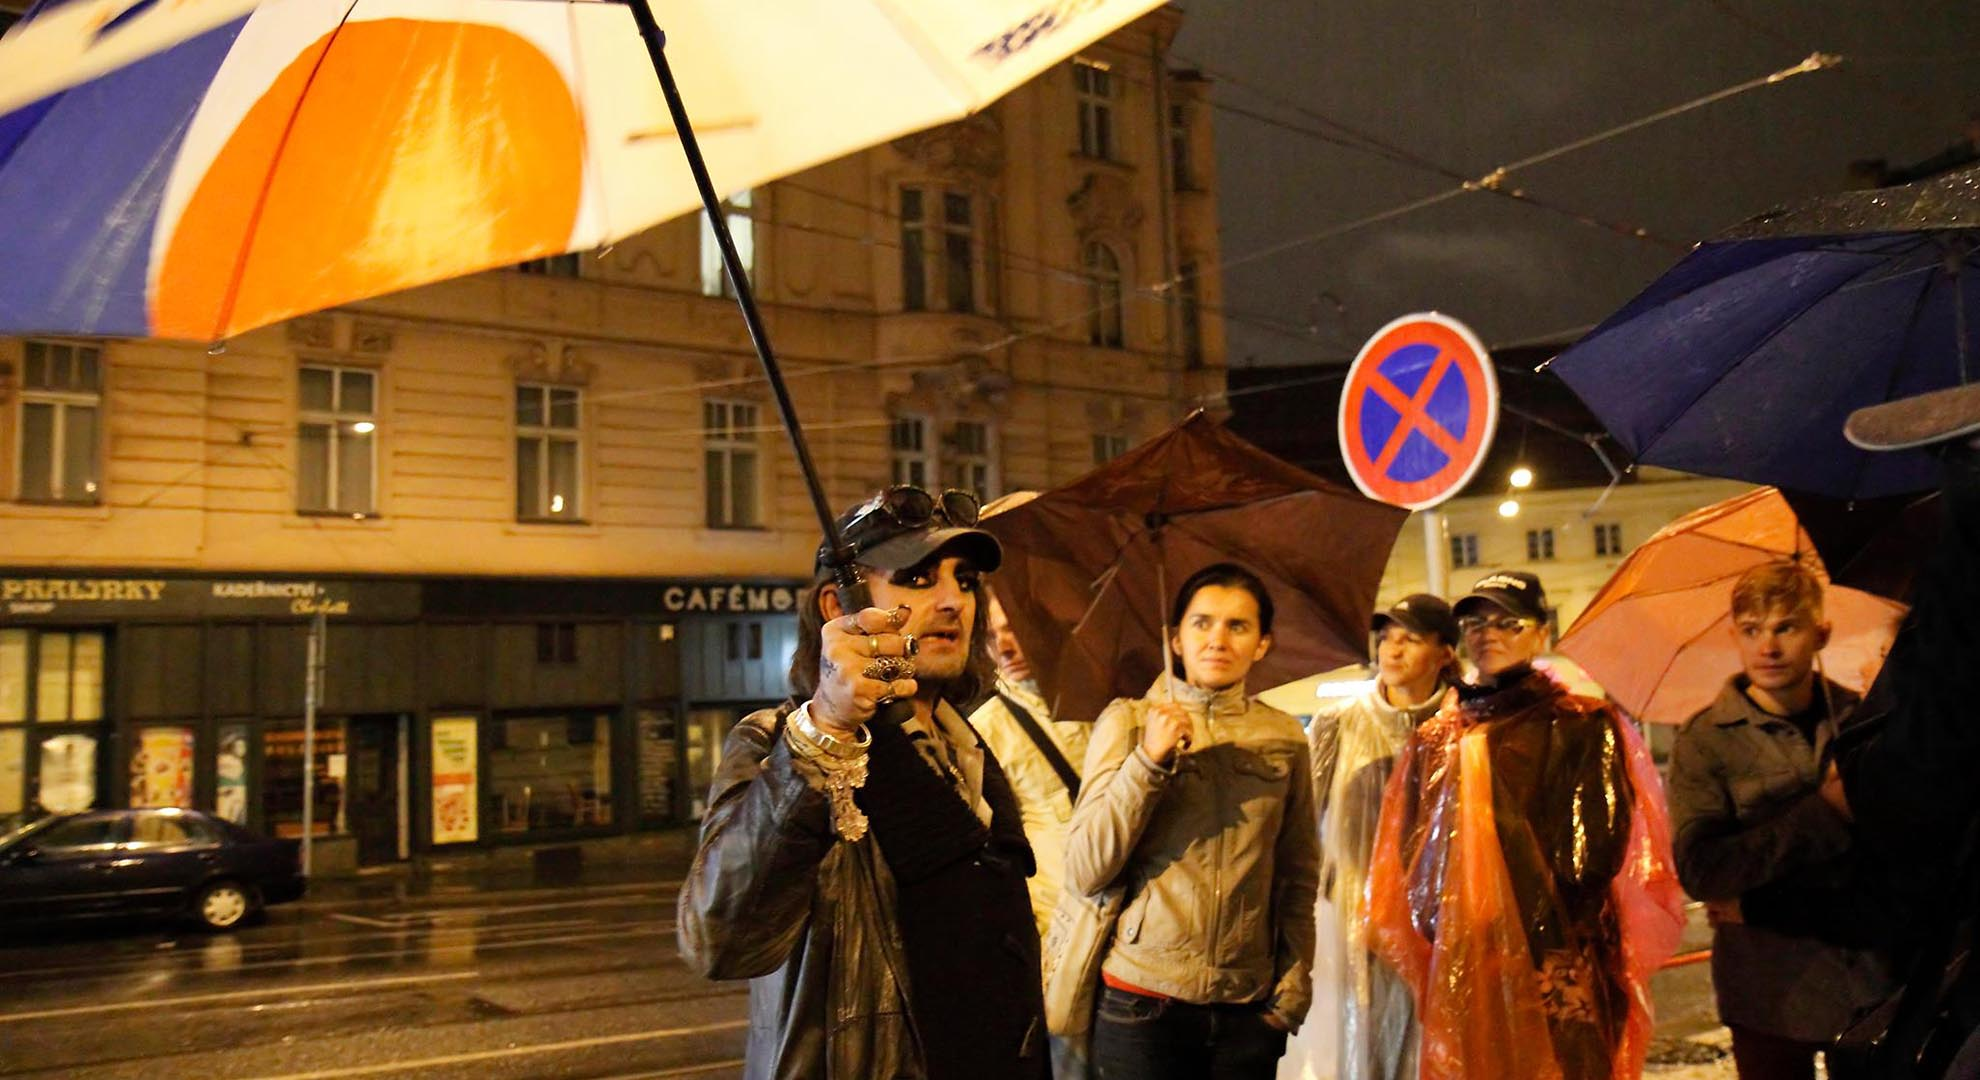 Poverty tourism in Praga. Guided tour by Pragulic